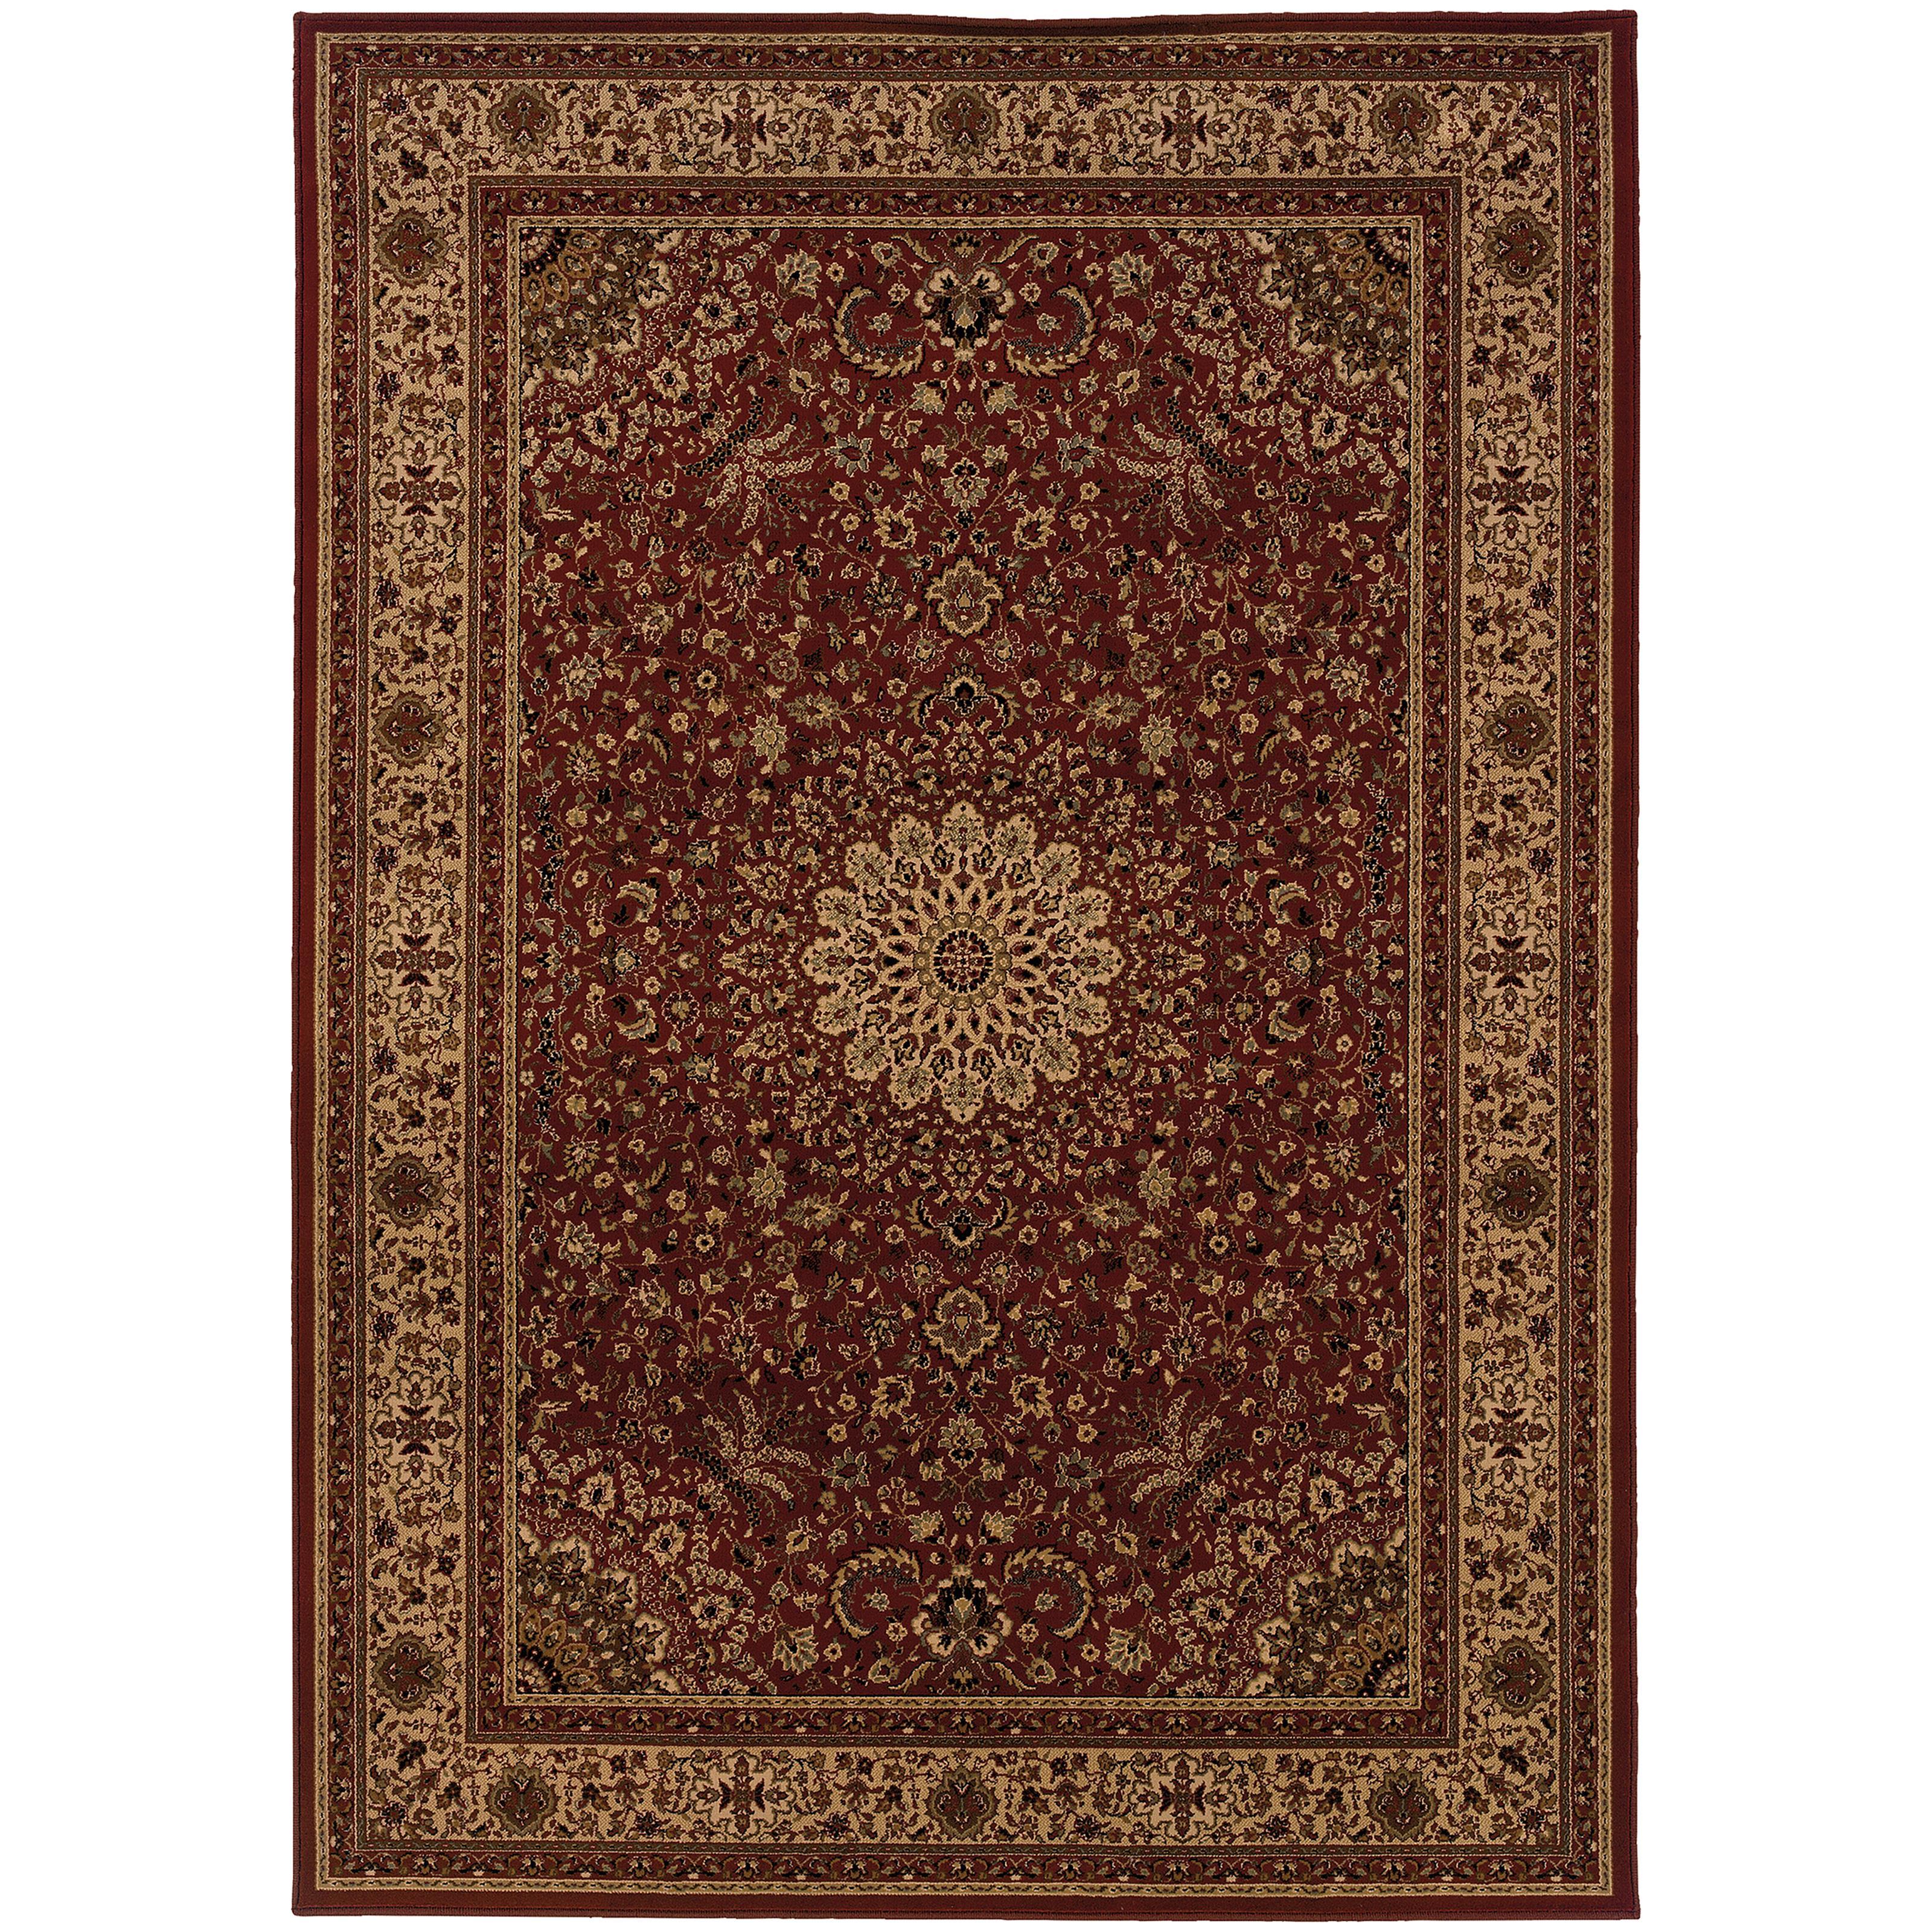 "Oriental Weavers Cambridge 6' 7"" X  9' 6"" Rug - Item Number: C195R2200290ST"